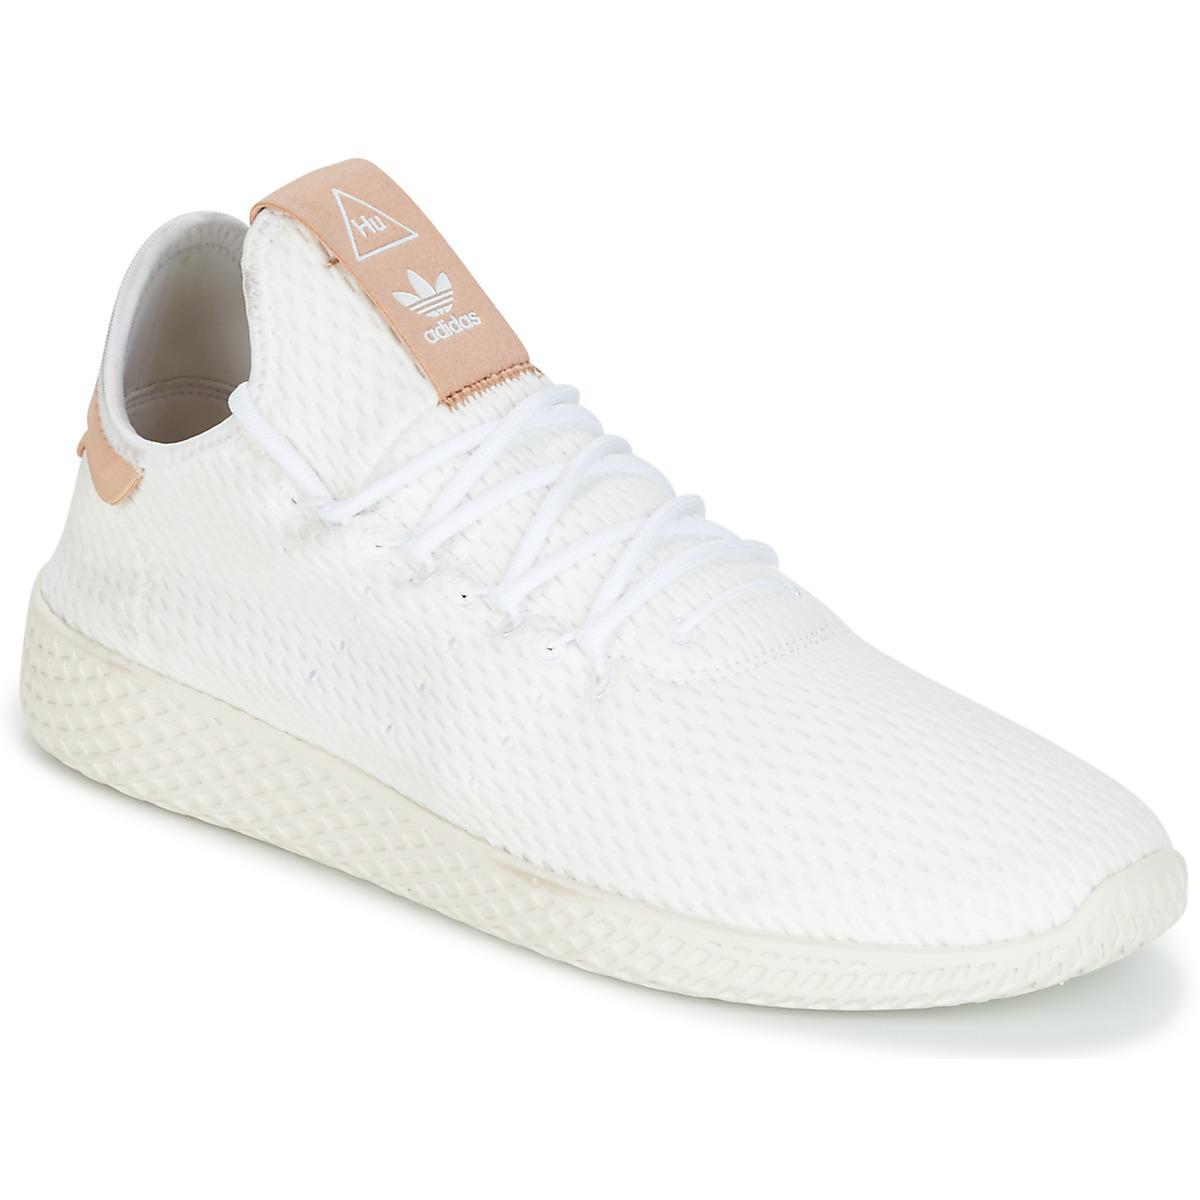 adidas Pharrell Williams Tennis Hu Women s Shoes (trainers) In White ... 6d6c31e3b